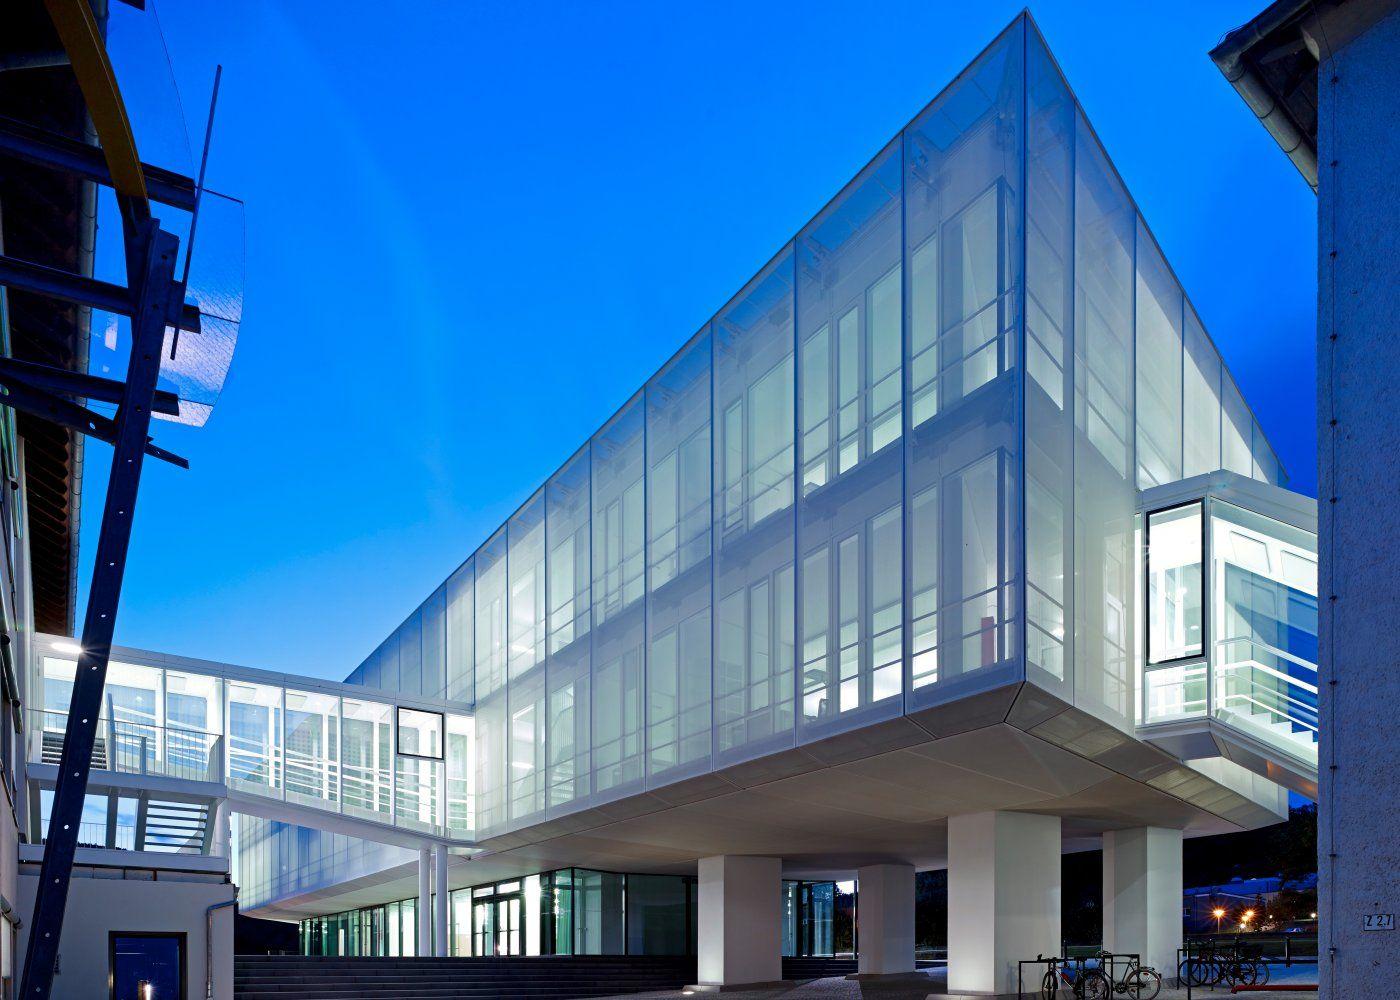 Architekten Jena hks architekten fritz lipmann institut jena a architecture